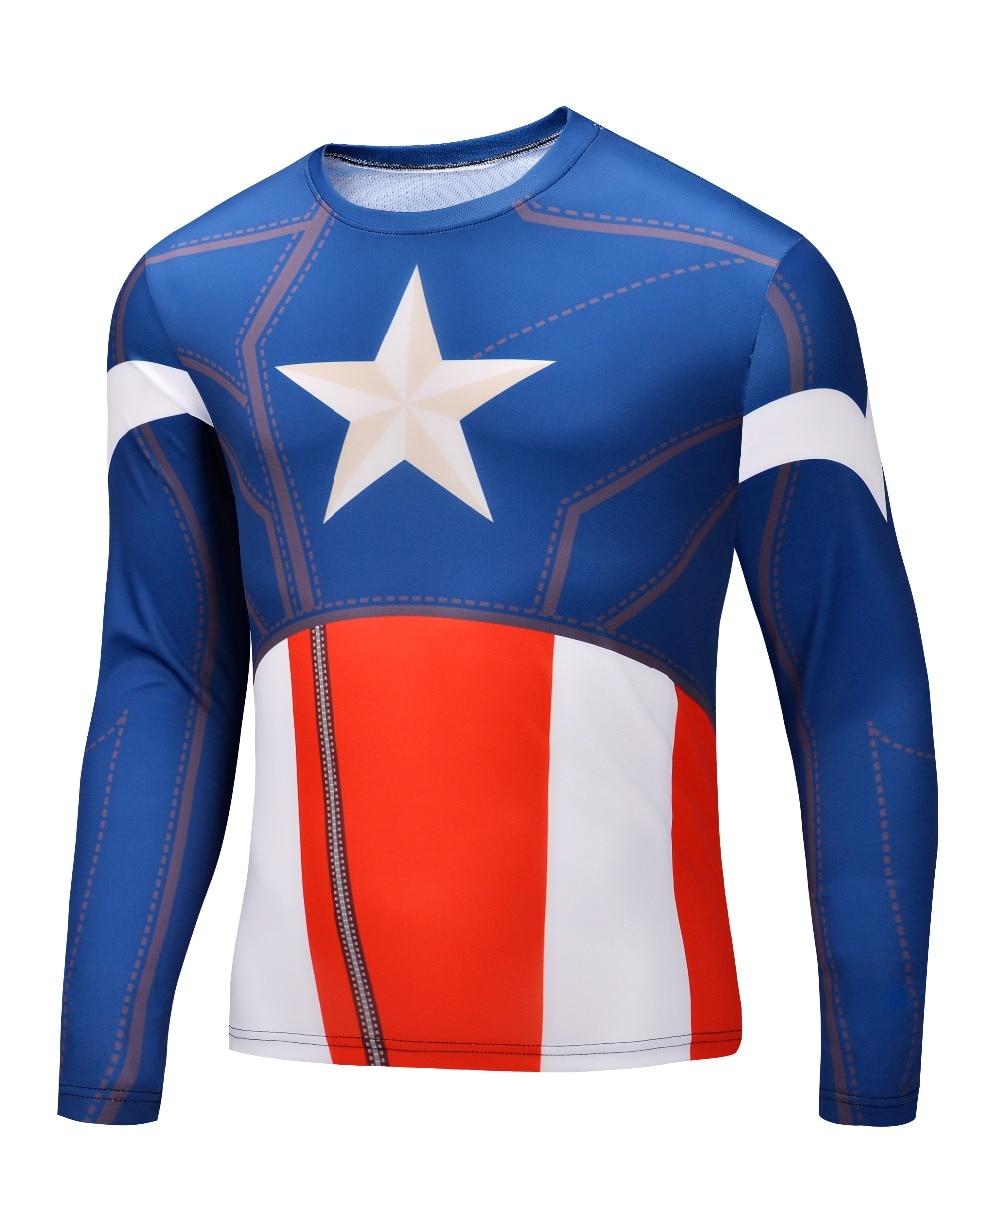 2015 Top Sales Superhero T shirt Superman Spiderman Batman Avengers Captain America Ironman 21 ...